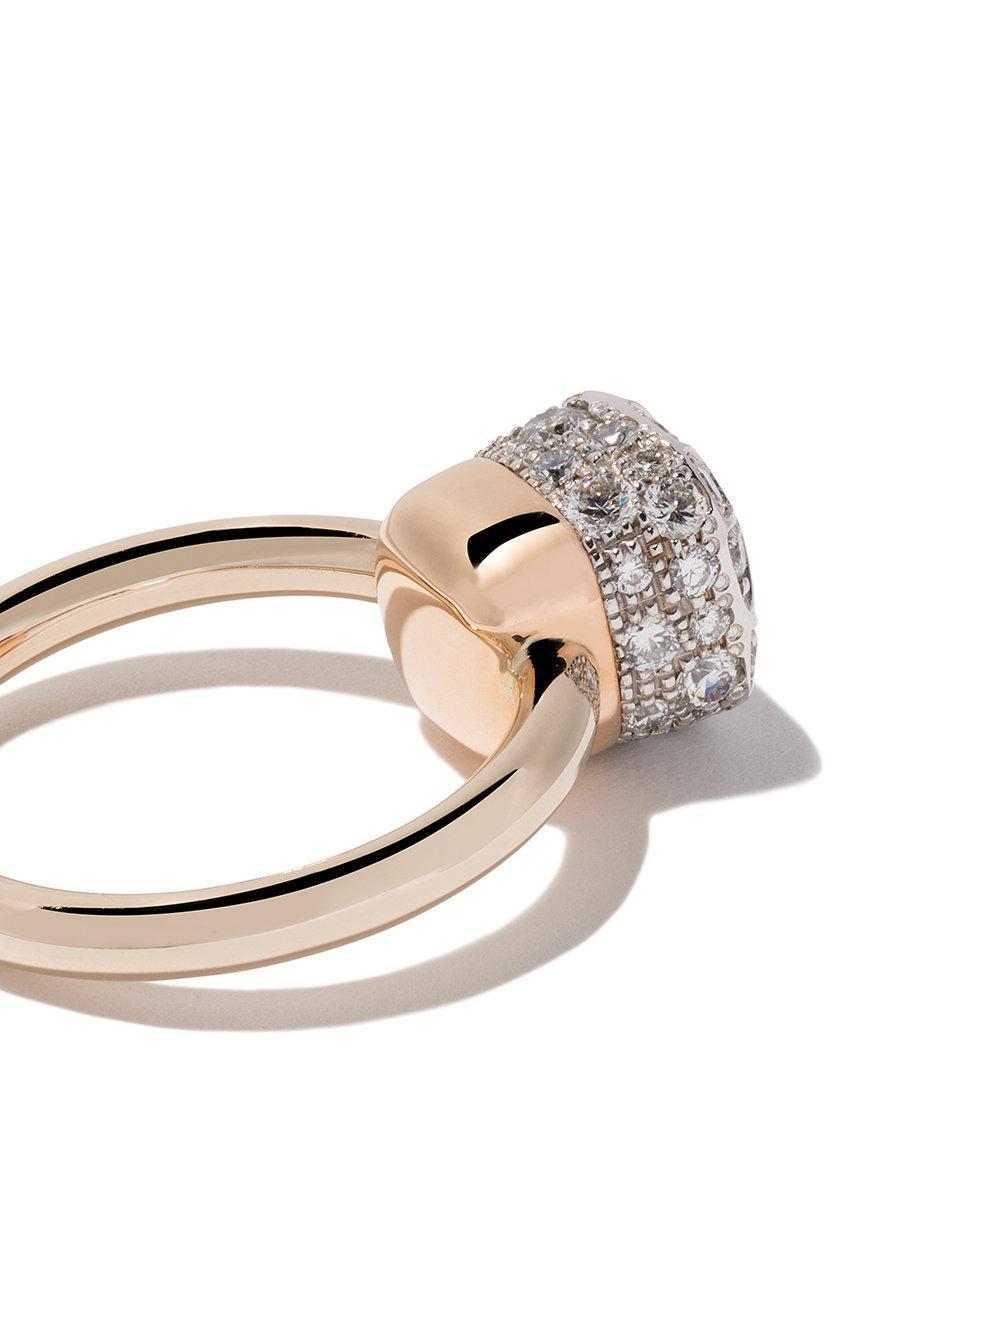 e8d2d4f0c583 Anillo Nudo Solitaire con diamantes en oro rosa 18kt y oro blanco ...